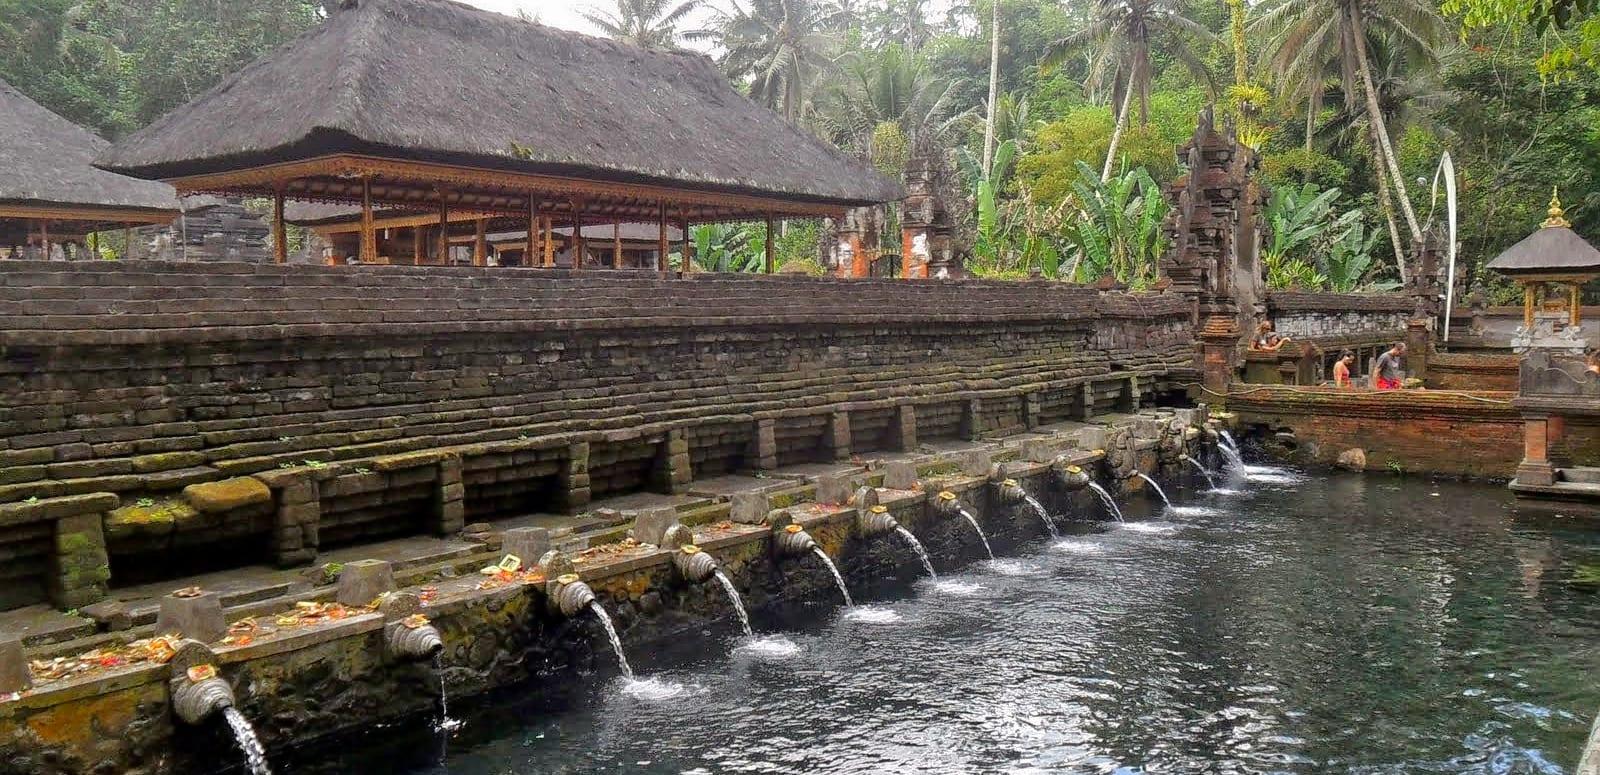 1574836891_holy-spring-2-tampak-siring-holy-spring-temple-ubud-bali-indonesia.jpg